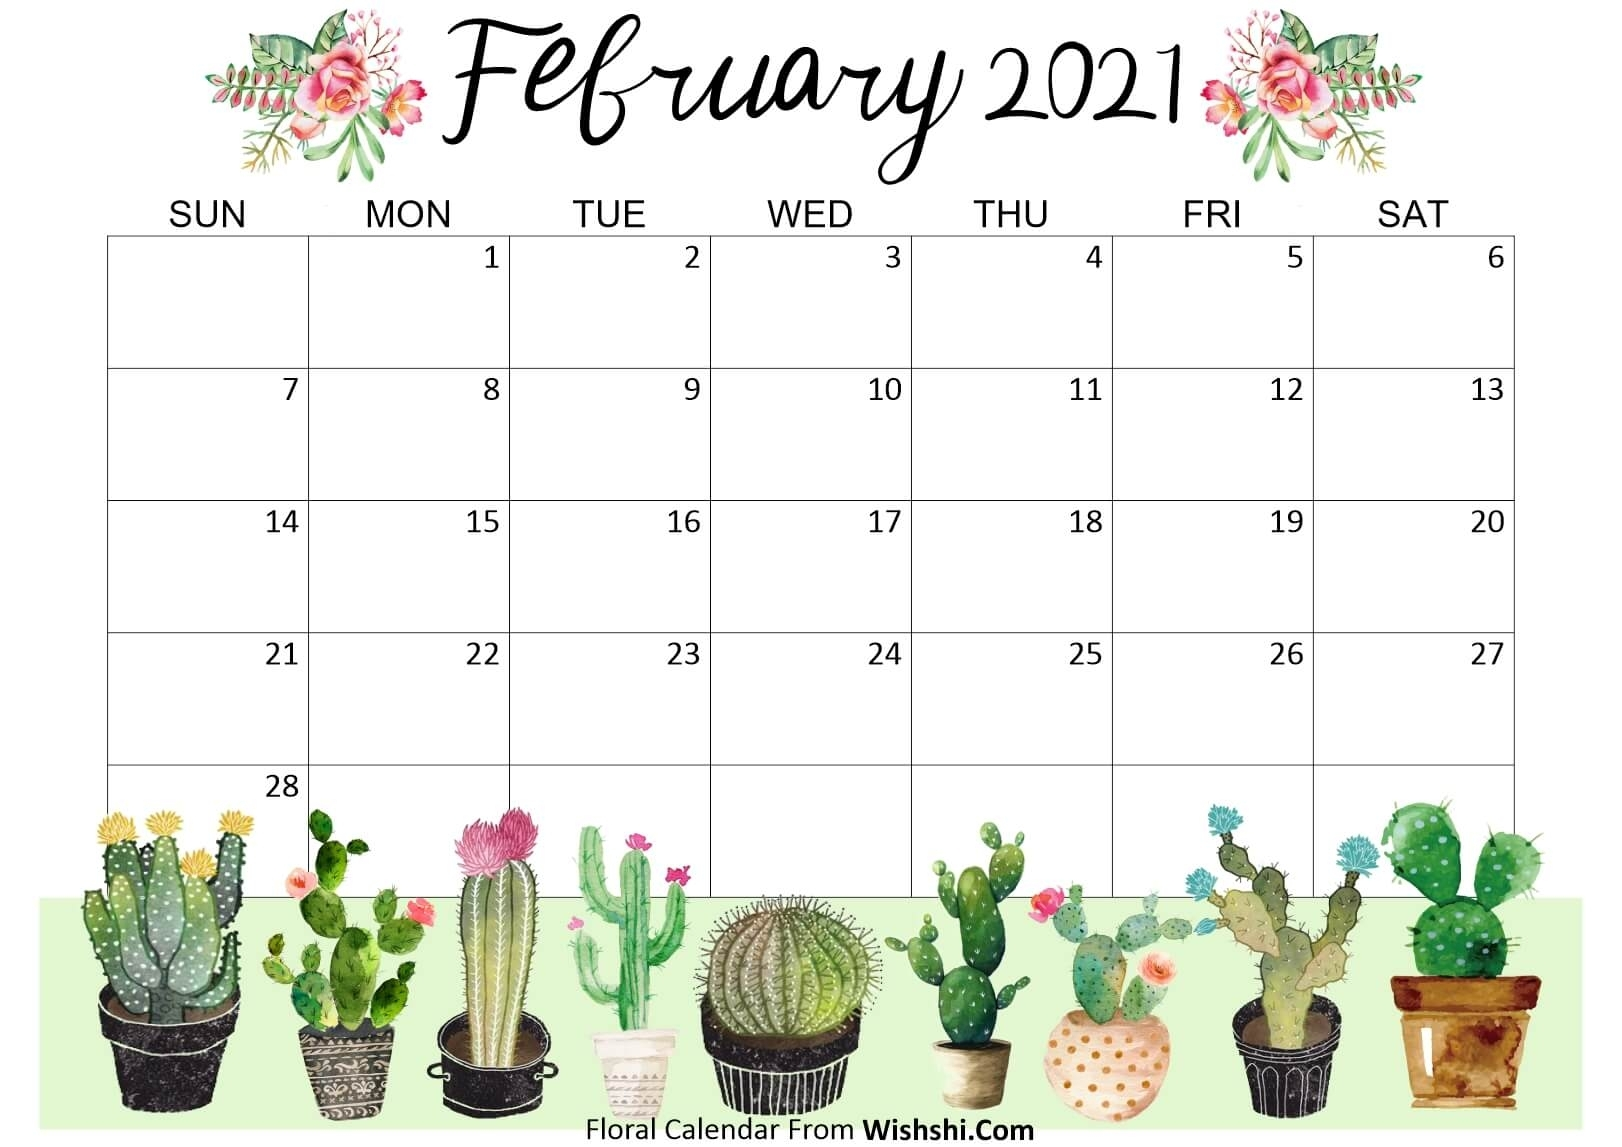 Floral February 2021 Calendar Printable - Free Printable